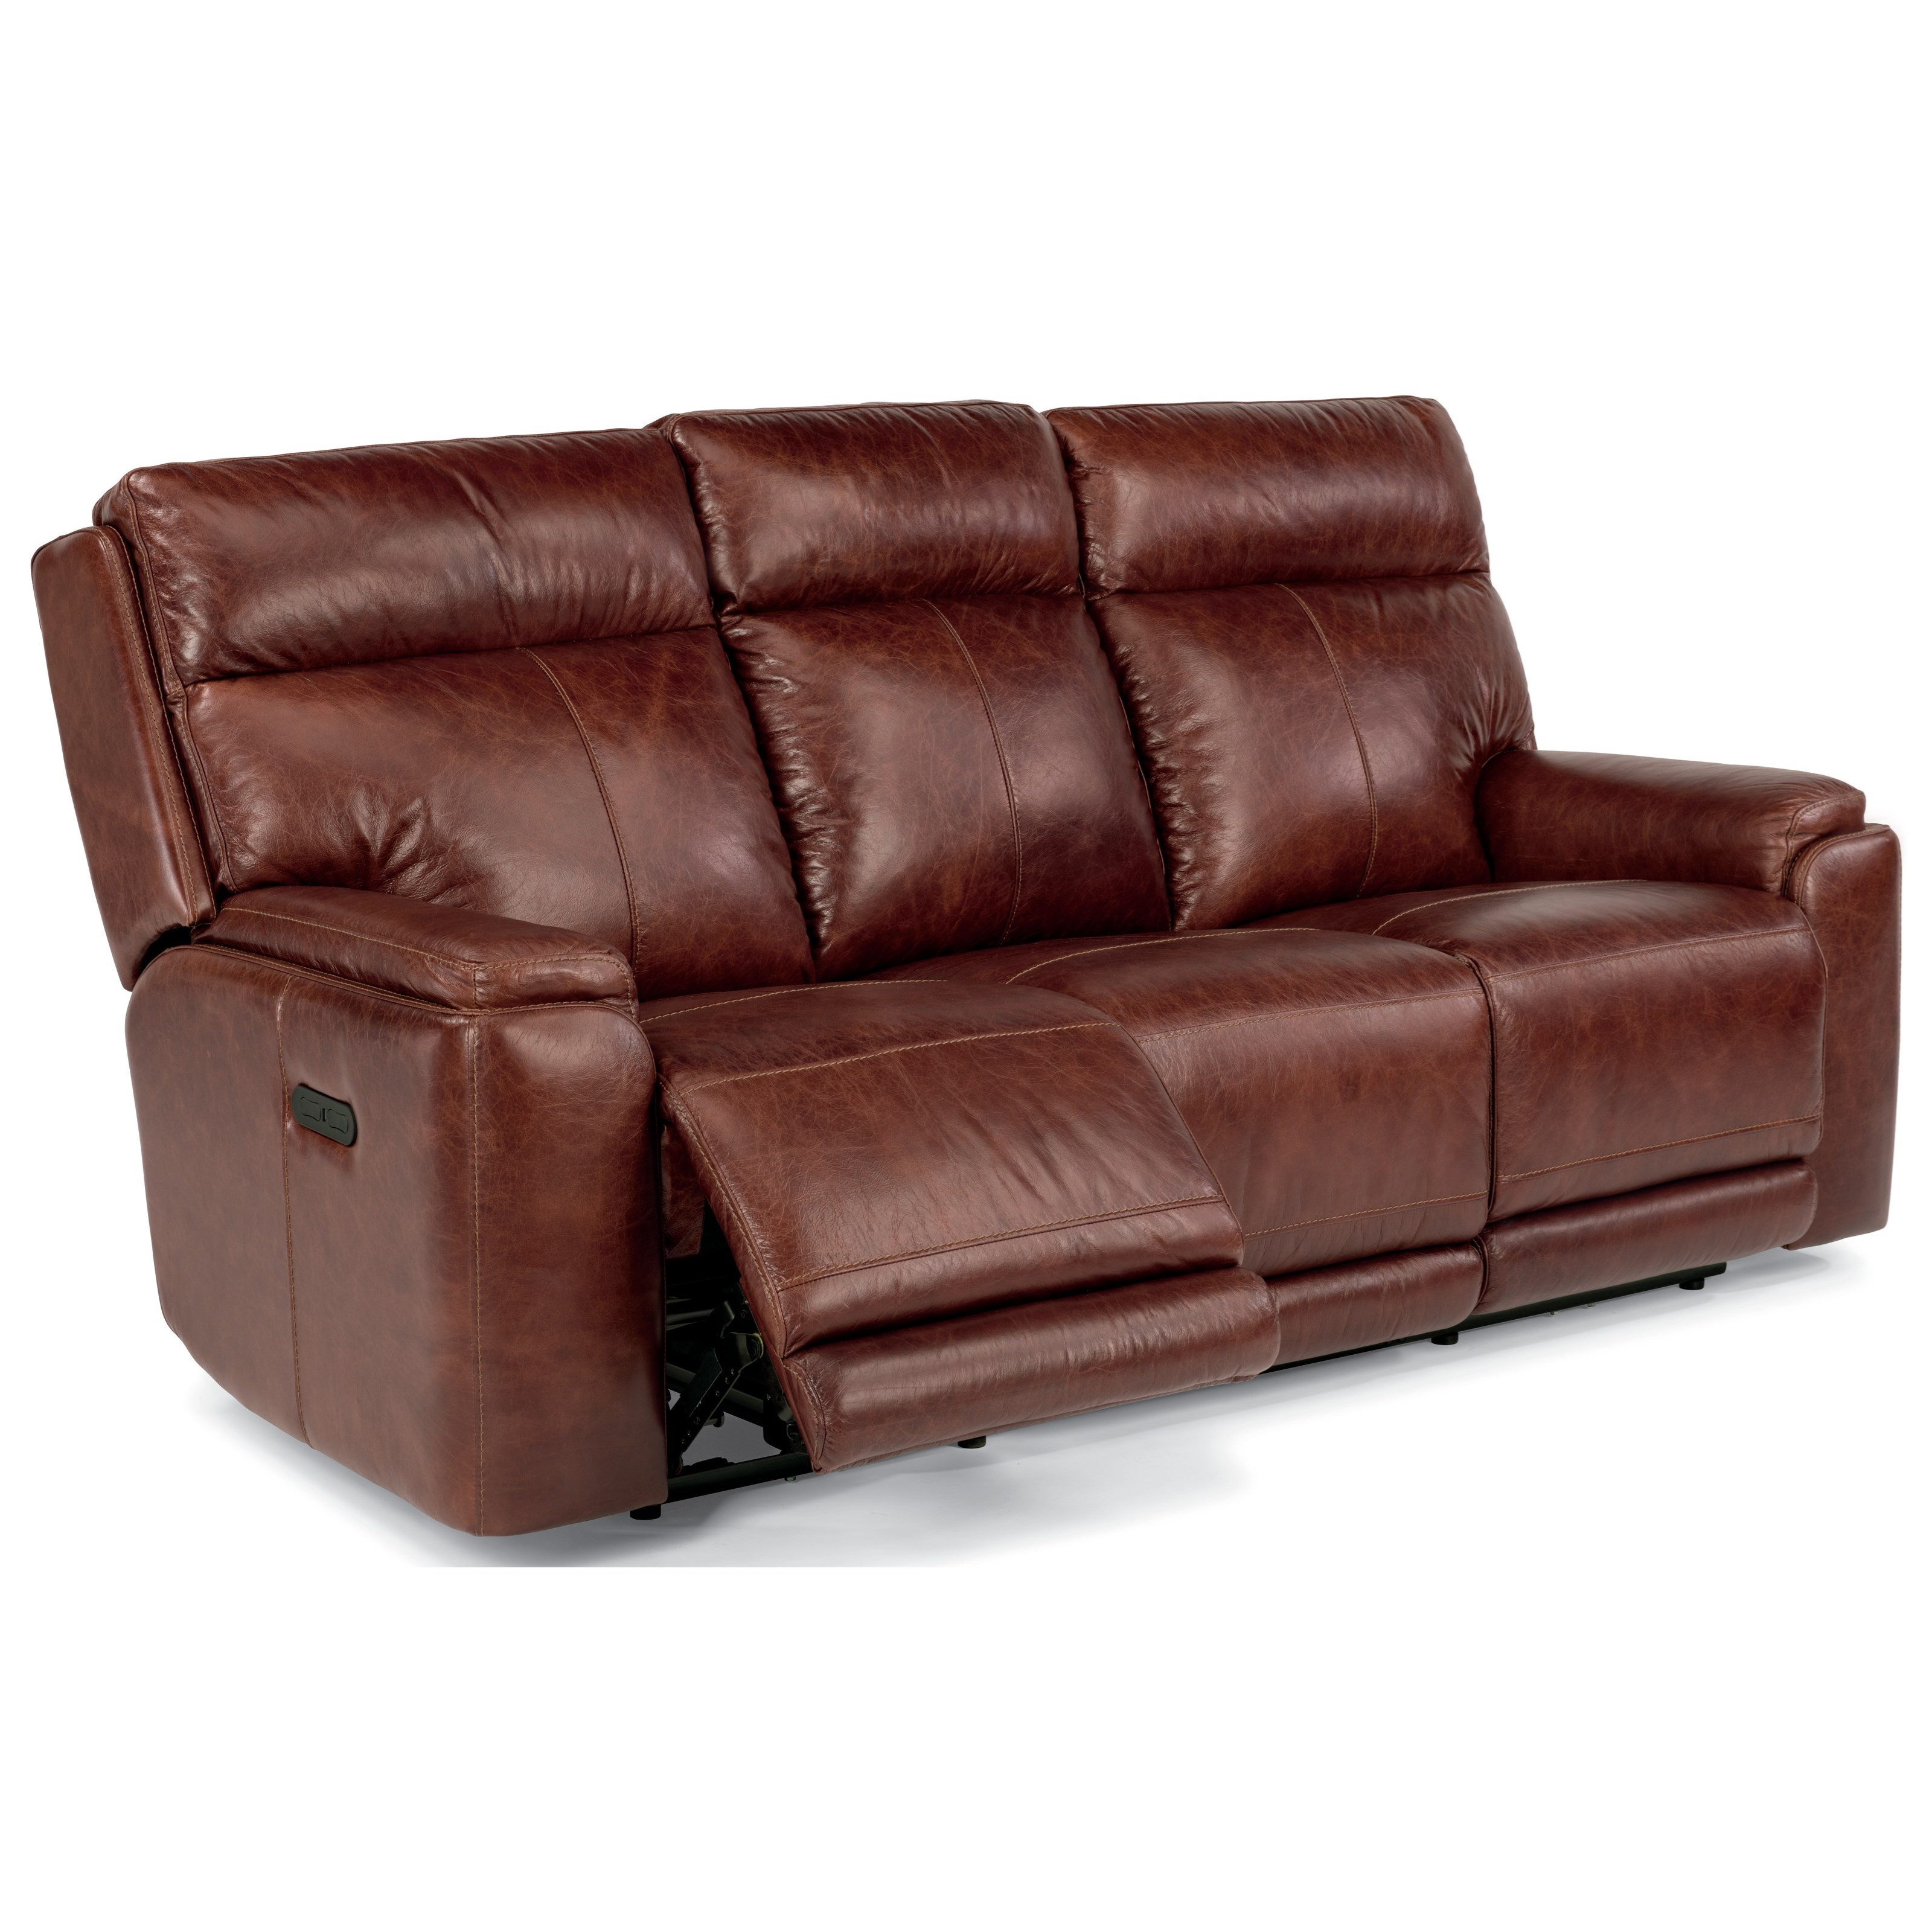 Flexsteel Latitudes Sienna 1675 62ph Power Reclining Sofa